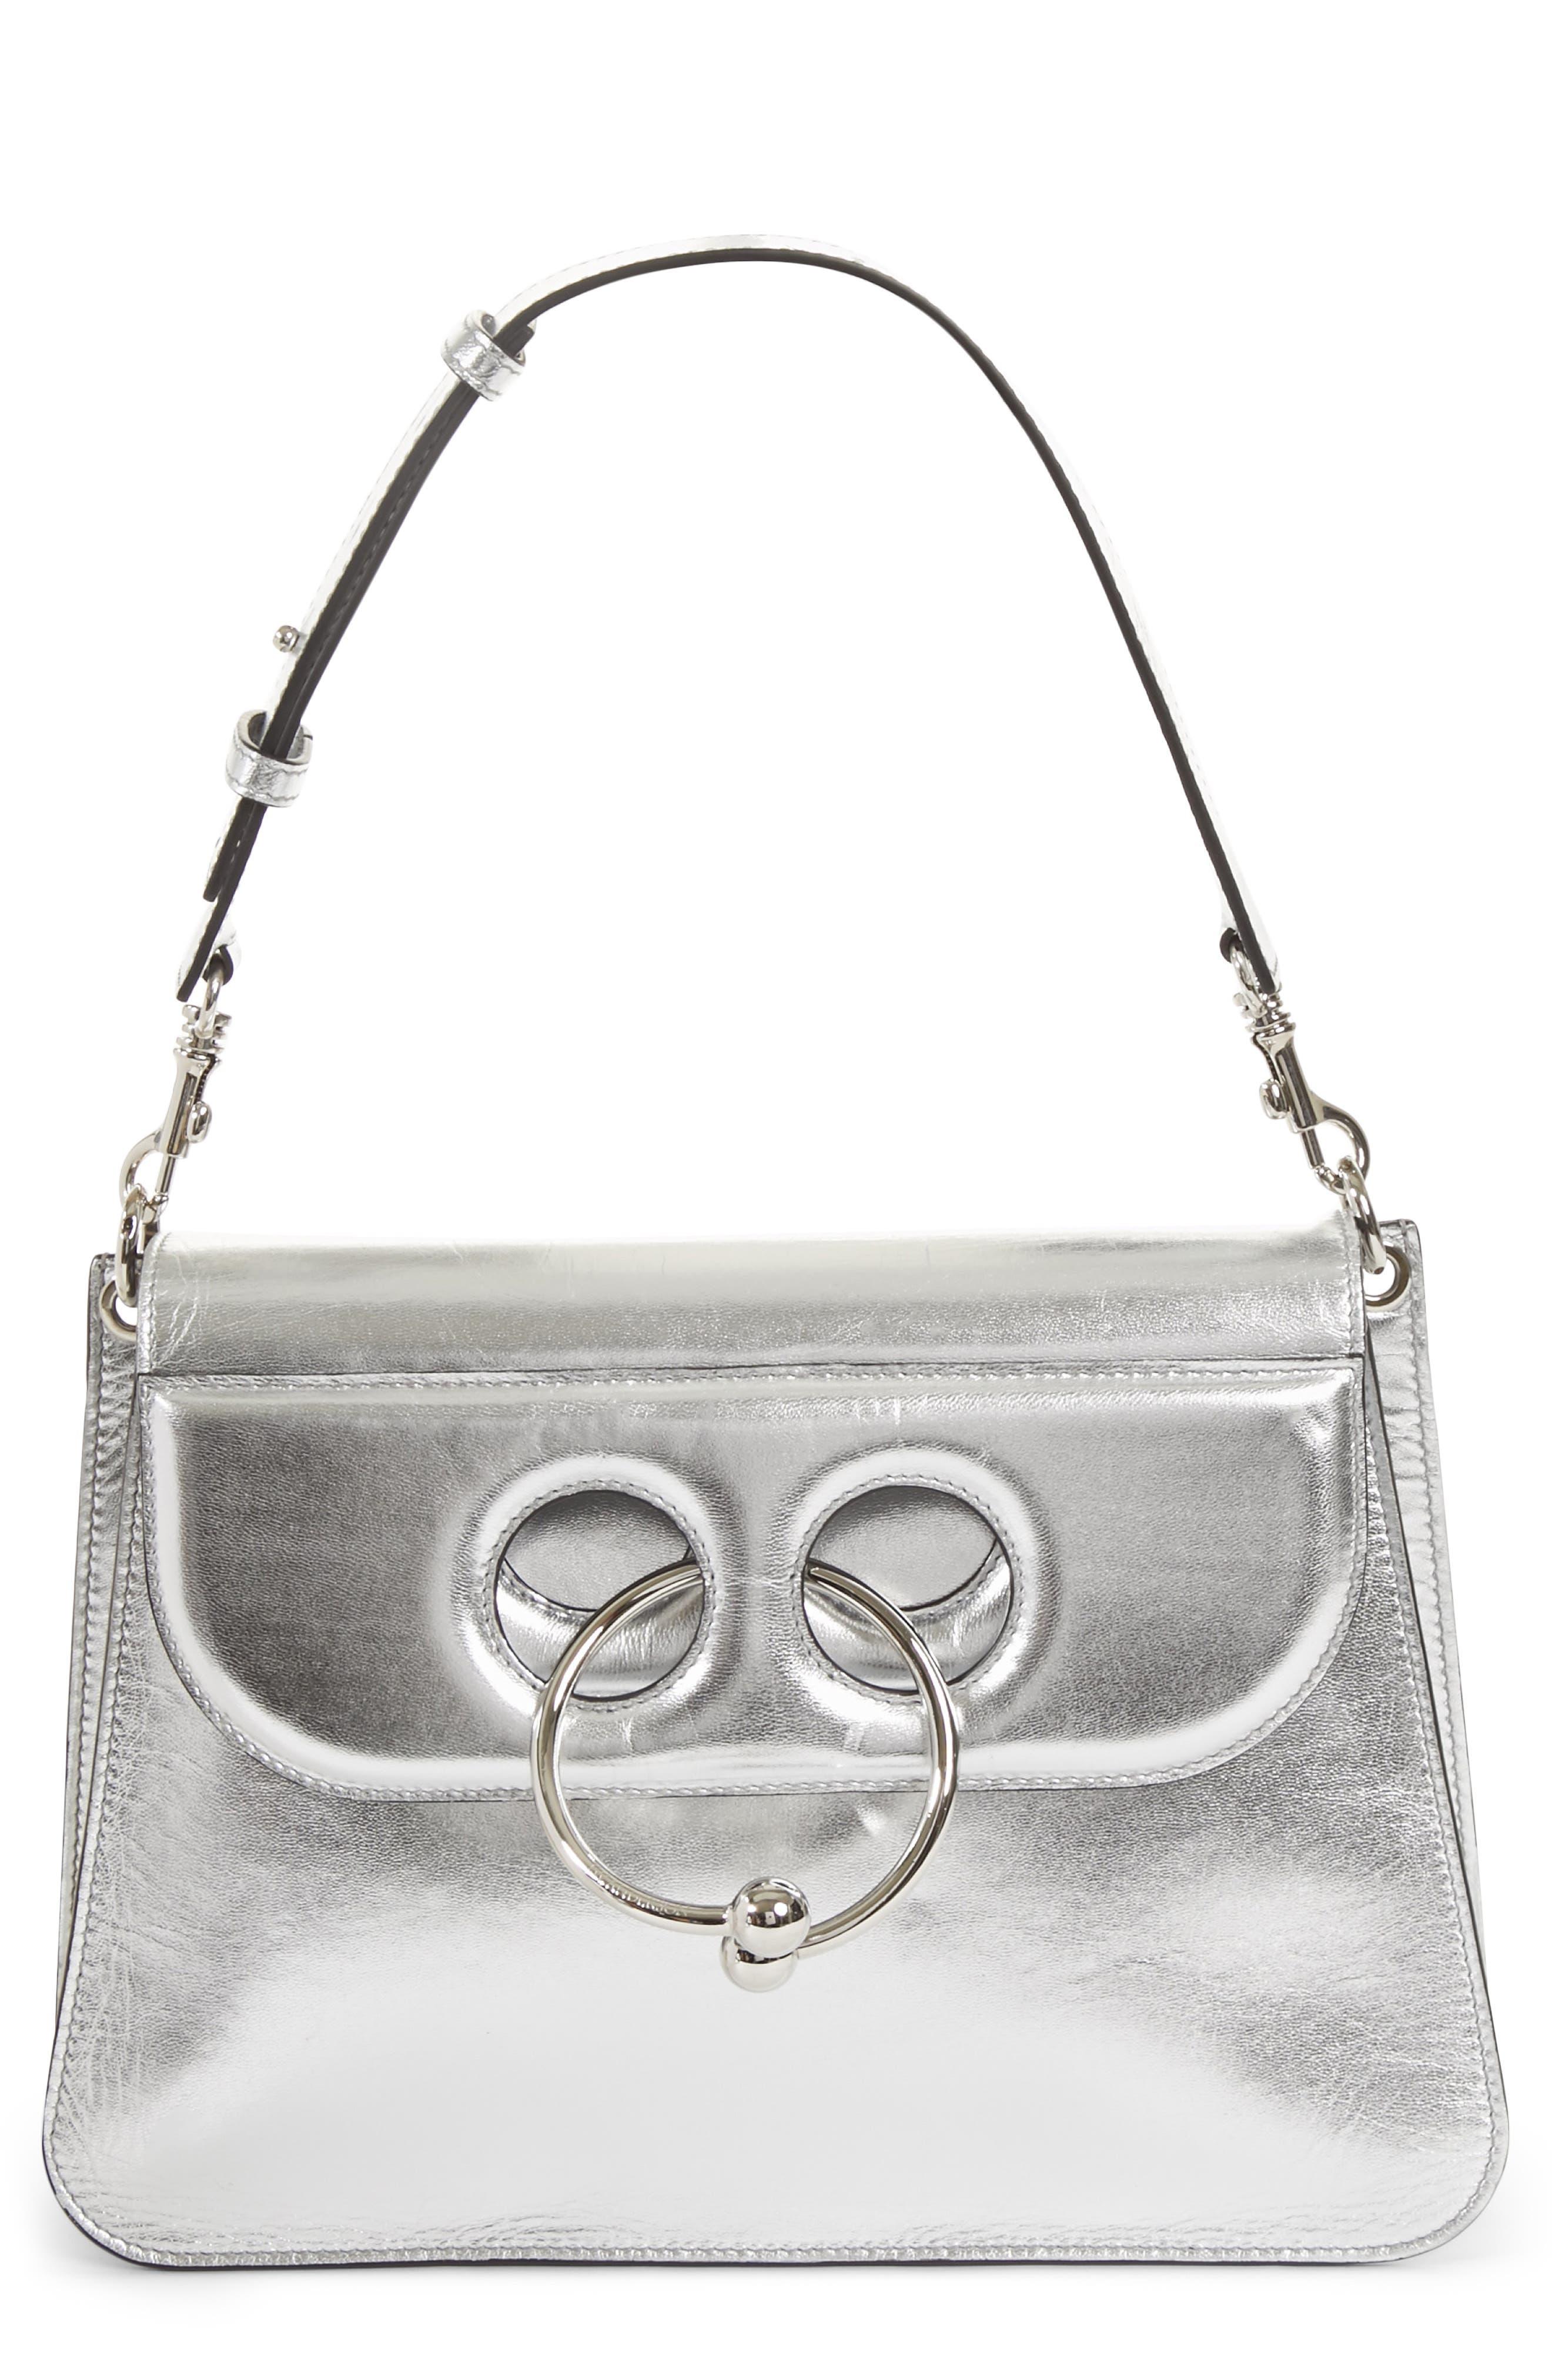 J.W.ANDERSON Medium Pierce Metallic Shoulder Bag,                         Main,                         color, 040